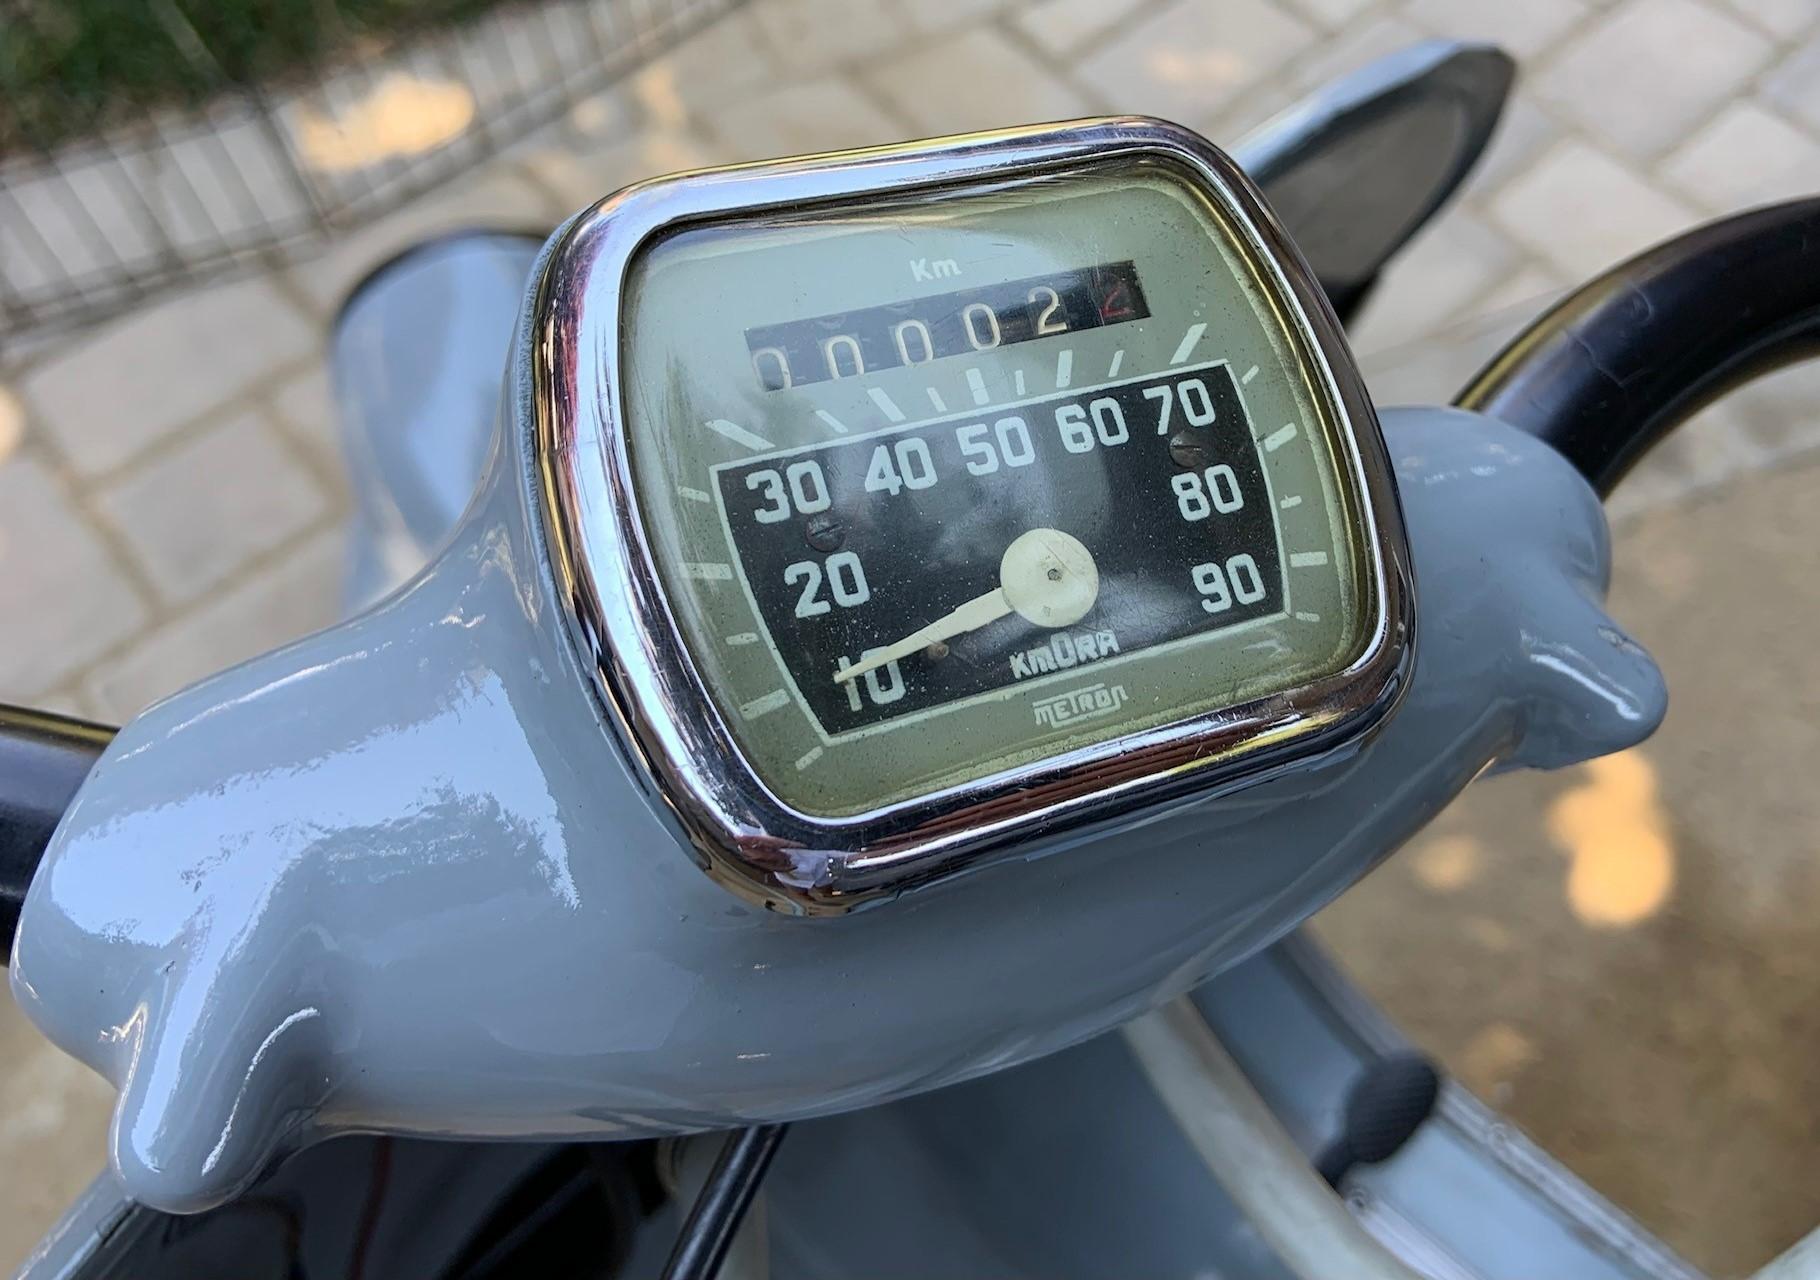 Josh Rogers - 1956 Vespa Ape - speedometer